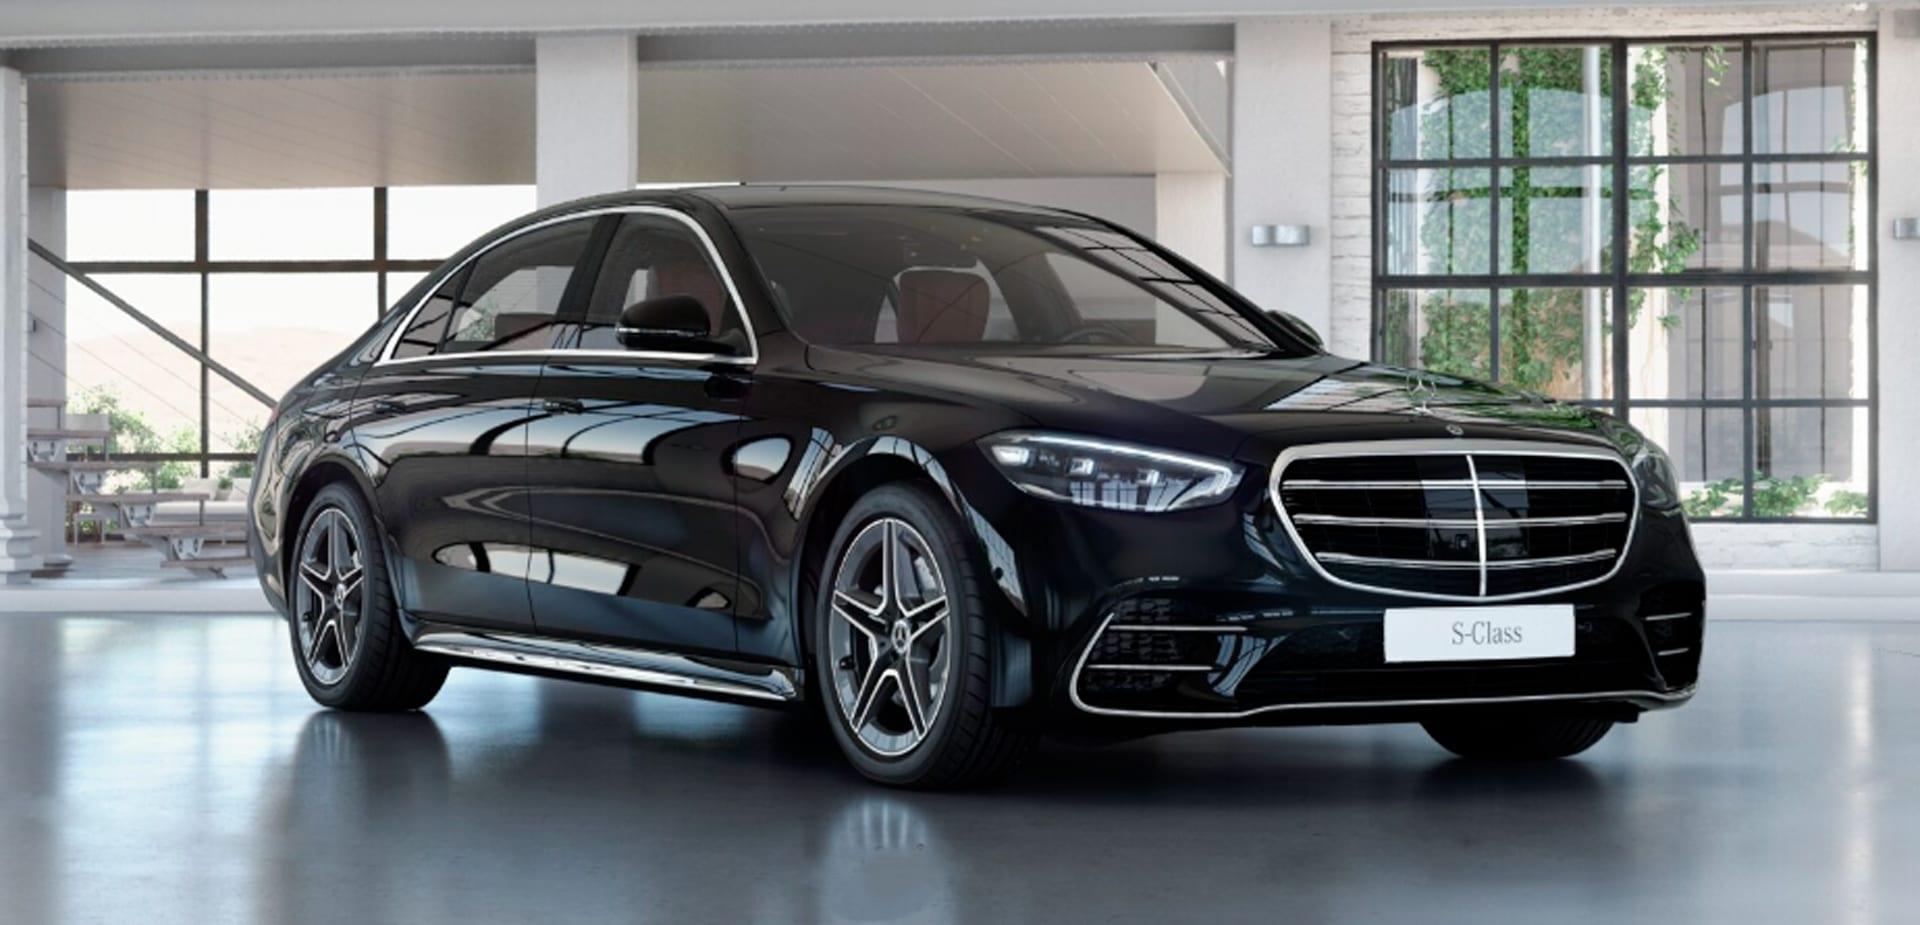 Mercedes-Benz S-Class Limousine 0152600488